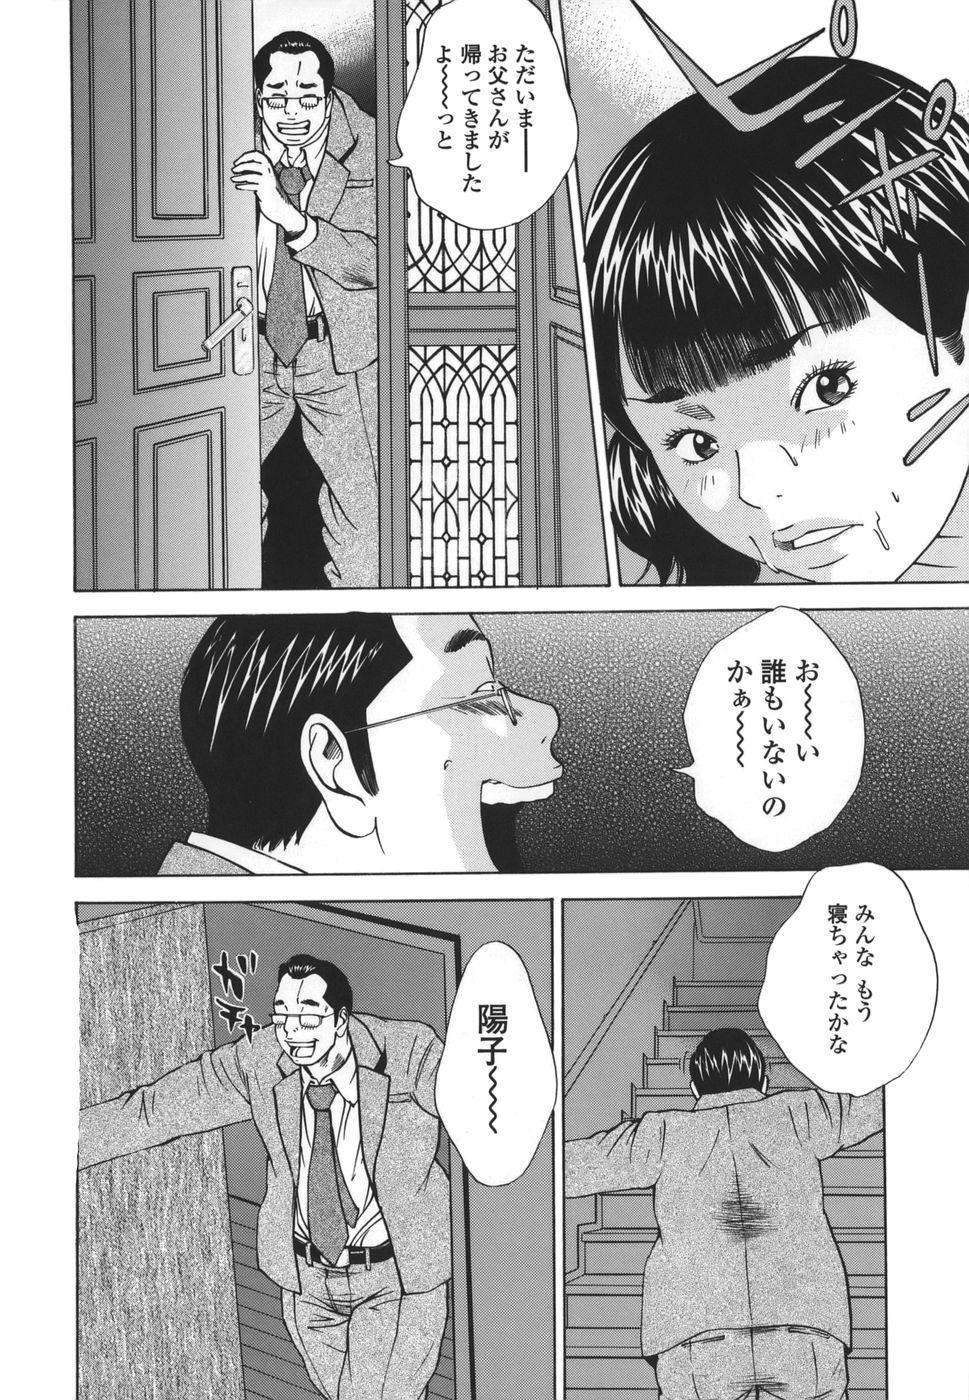 Kinshin Goukan - Near Relation Rapes 133